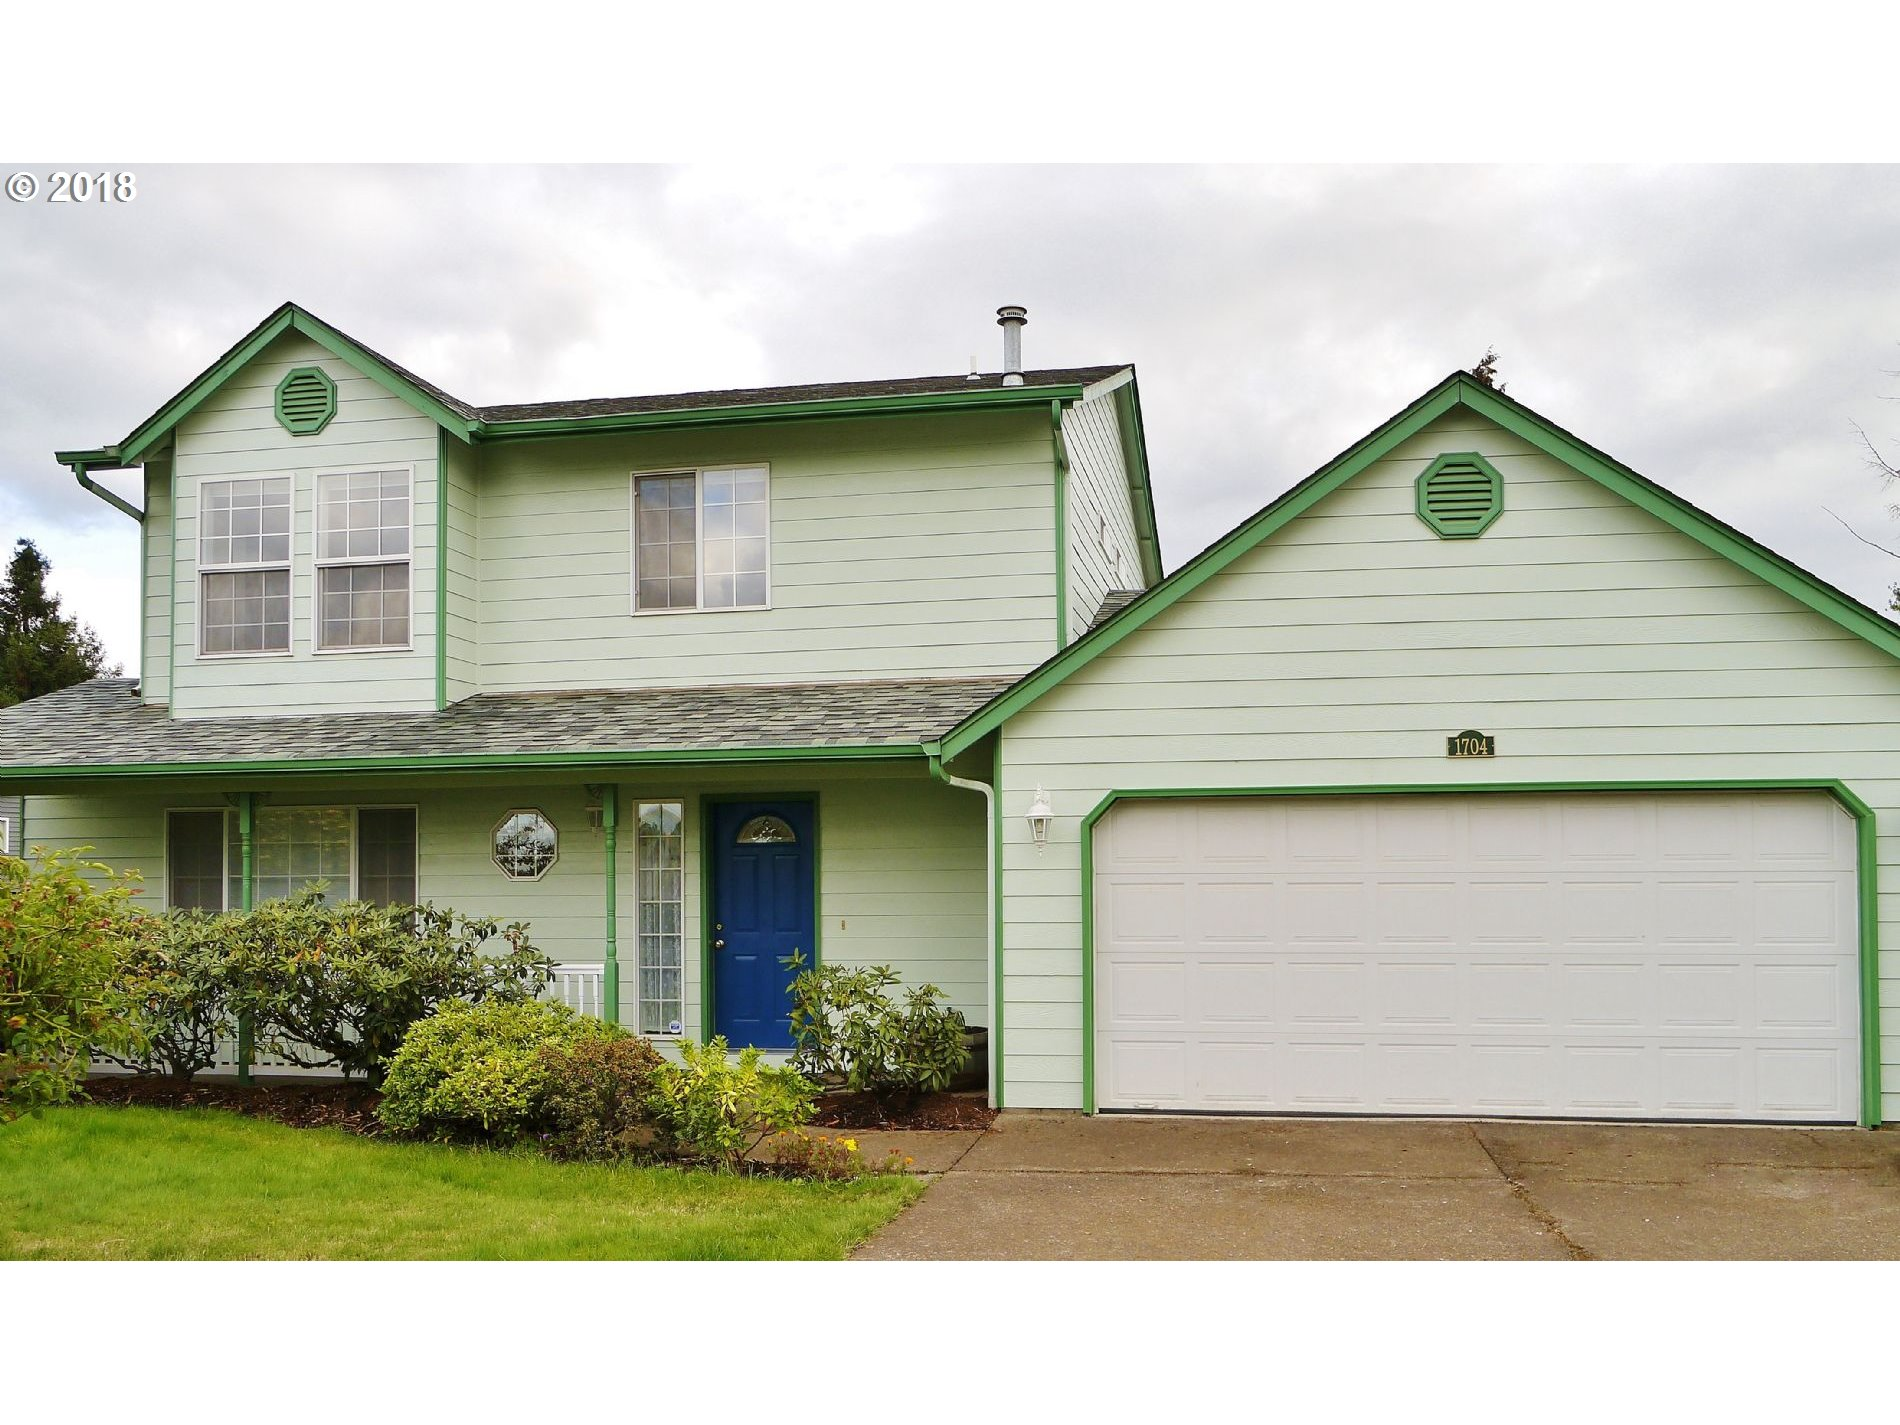 1704 NW AMMON ST Salem, OR 97304 - MLS #: 18631702